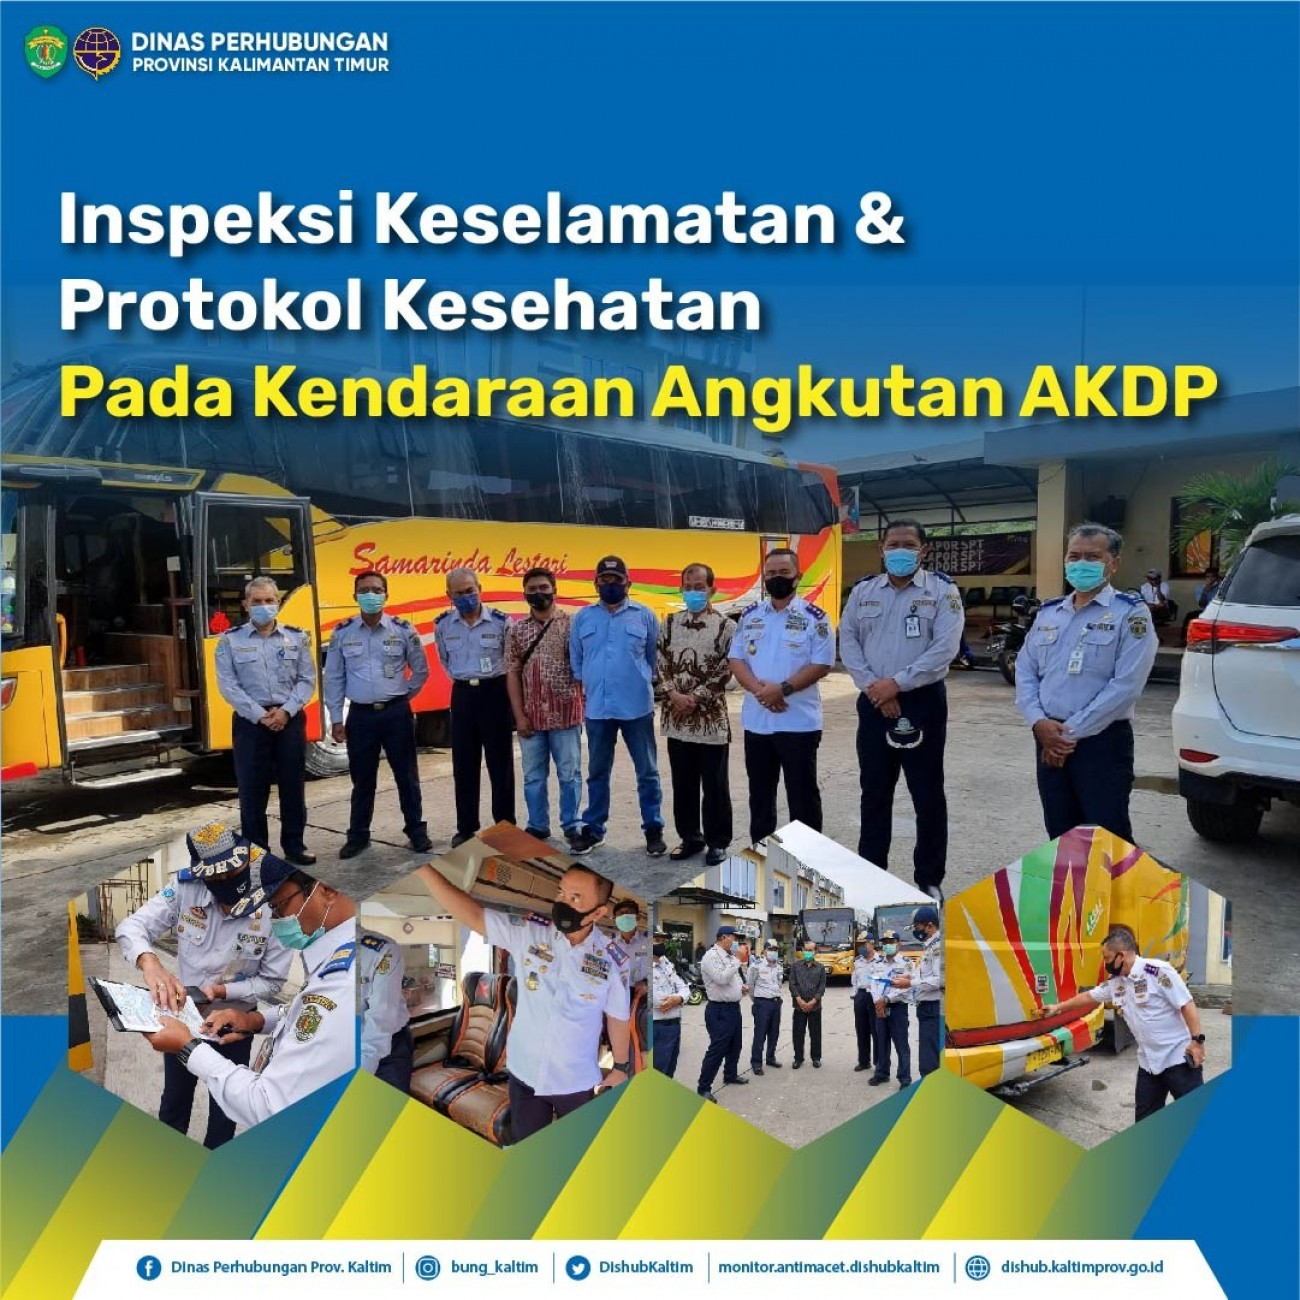 Inspeksi Keselamatan & Protokol Kesehatan Pada Kendaraan Angkutan AKDP